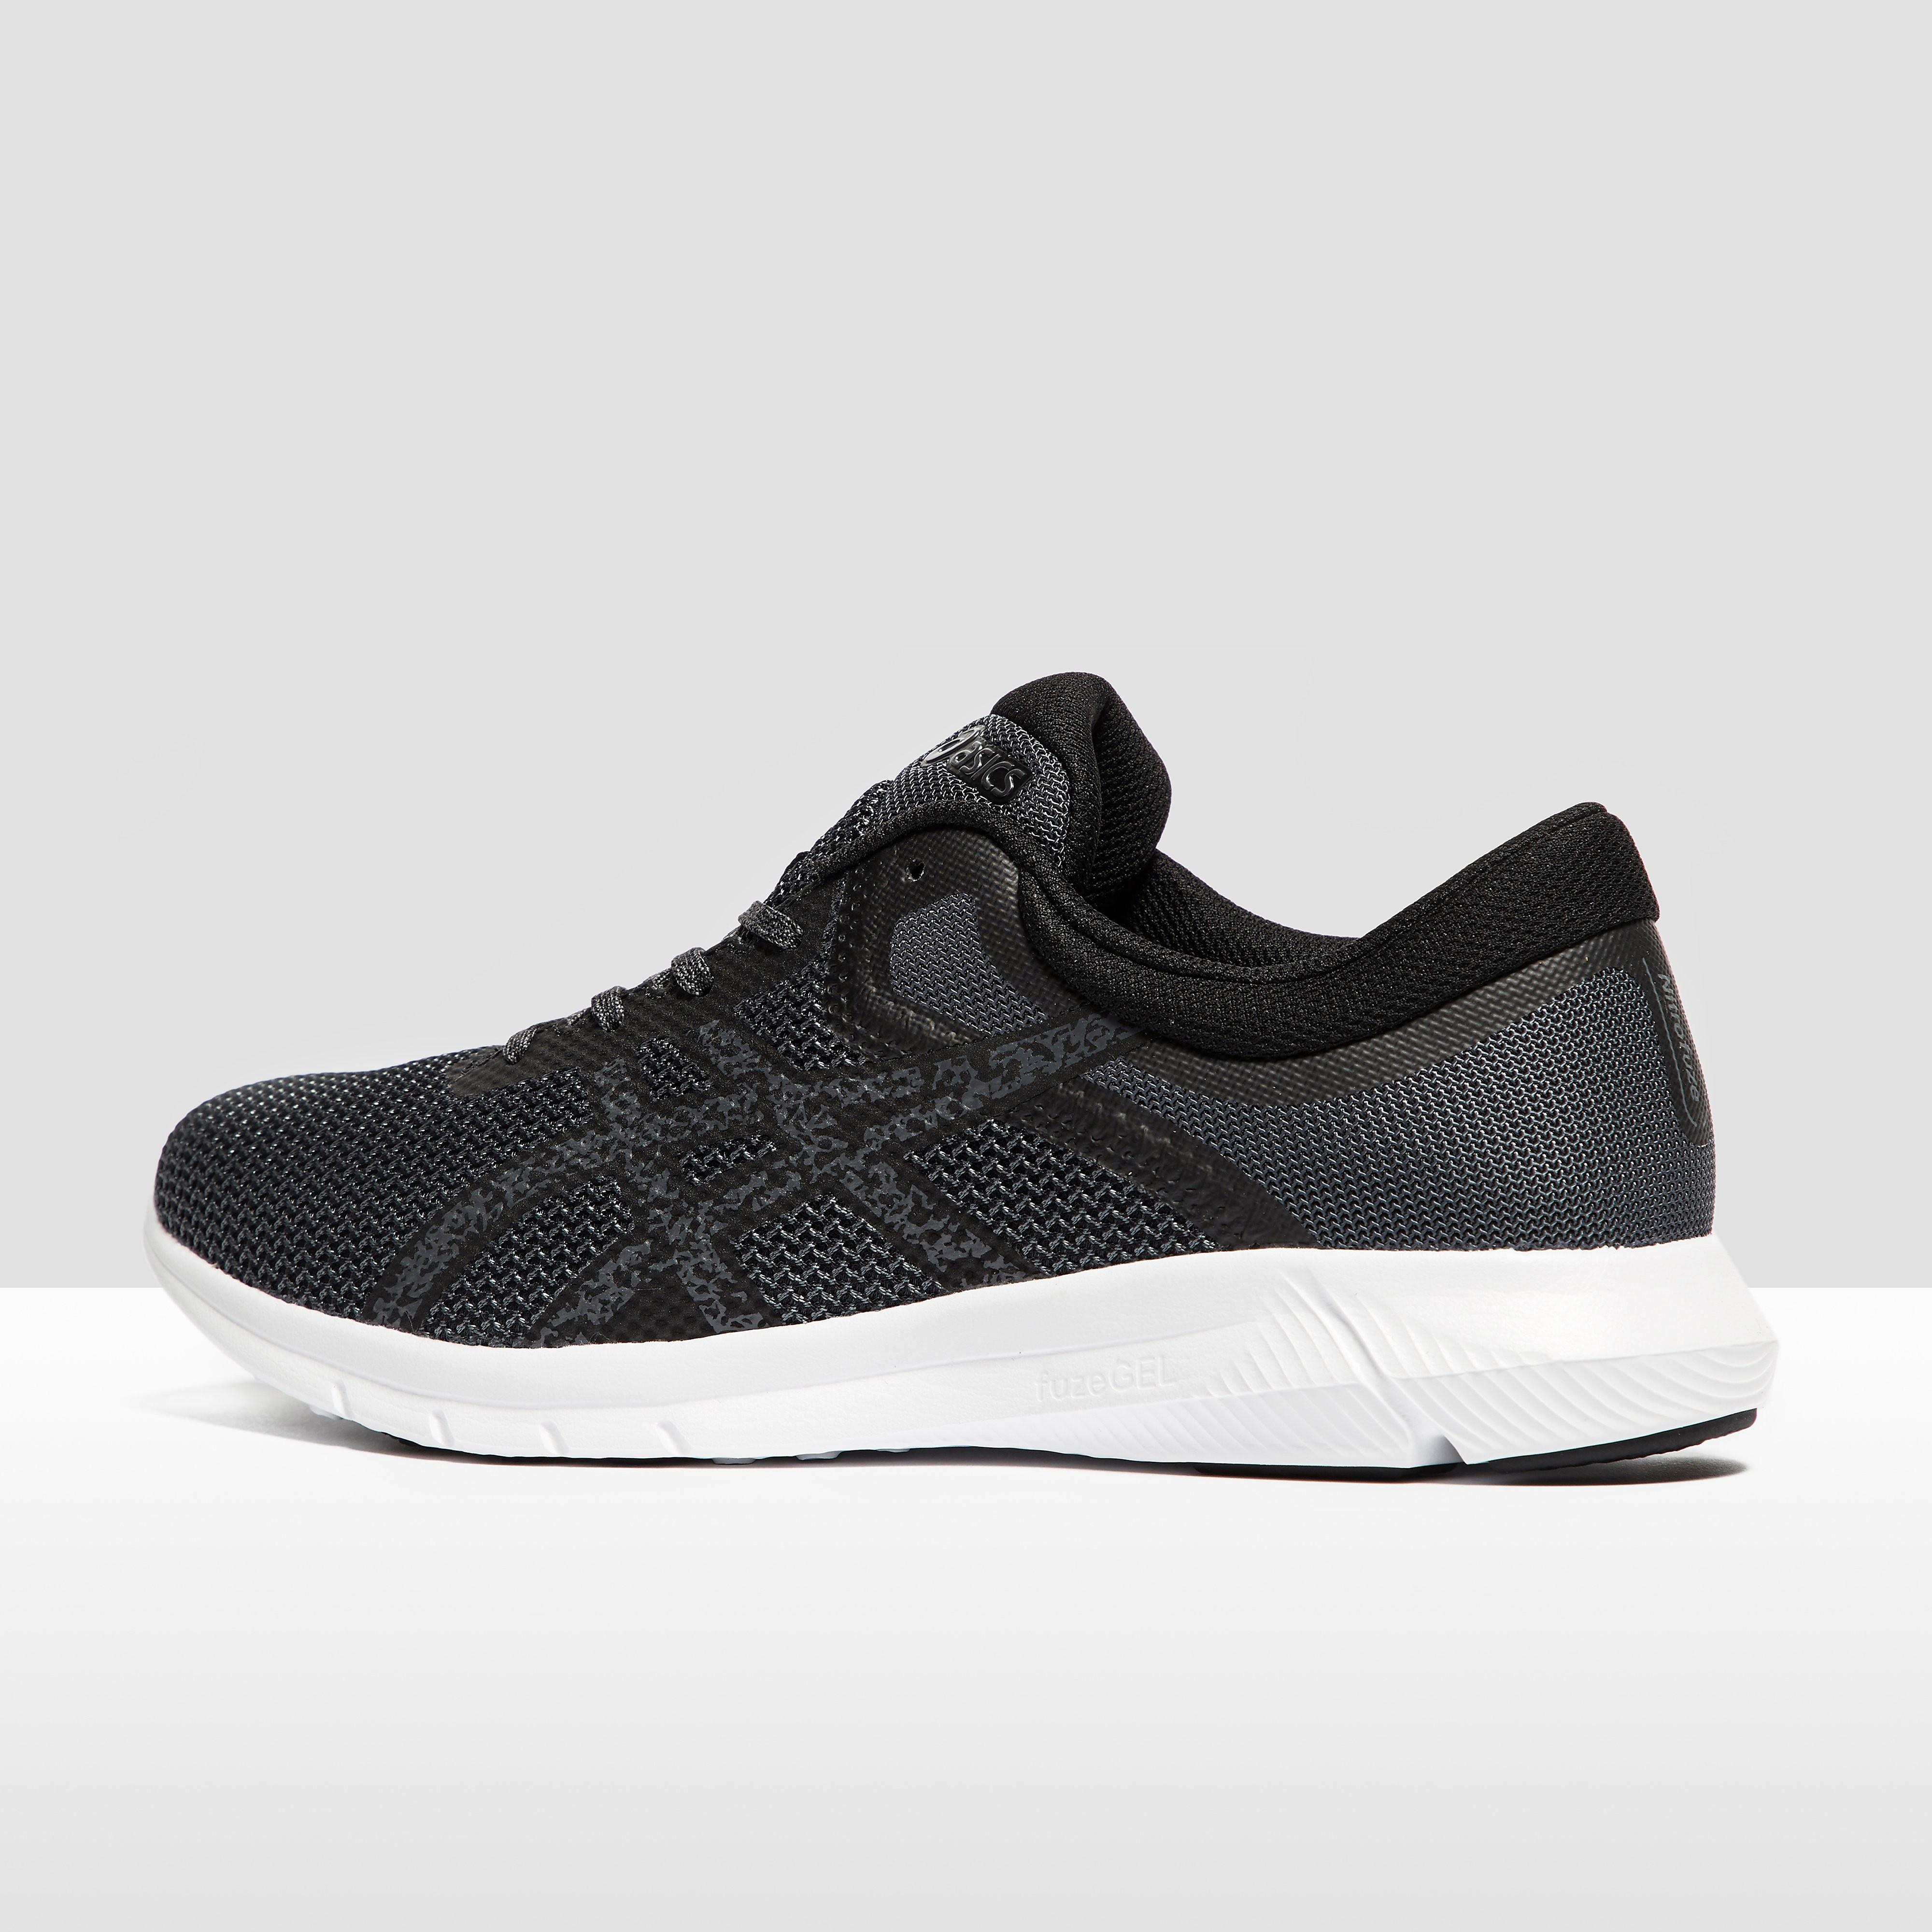 ASICS Nitrofuze 2 Men's Running Shoes